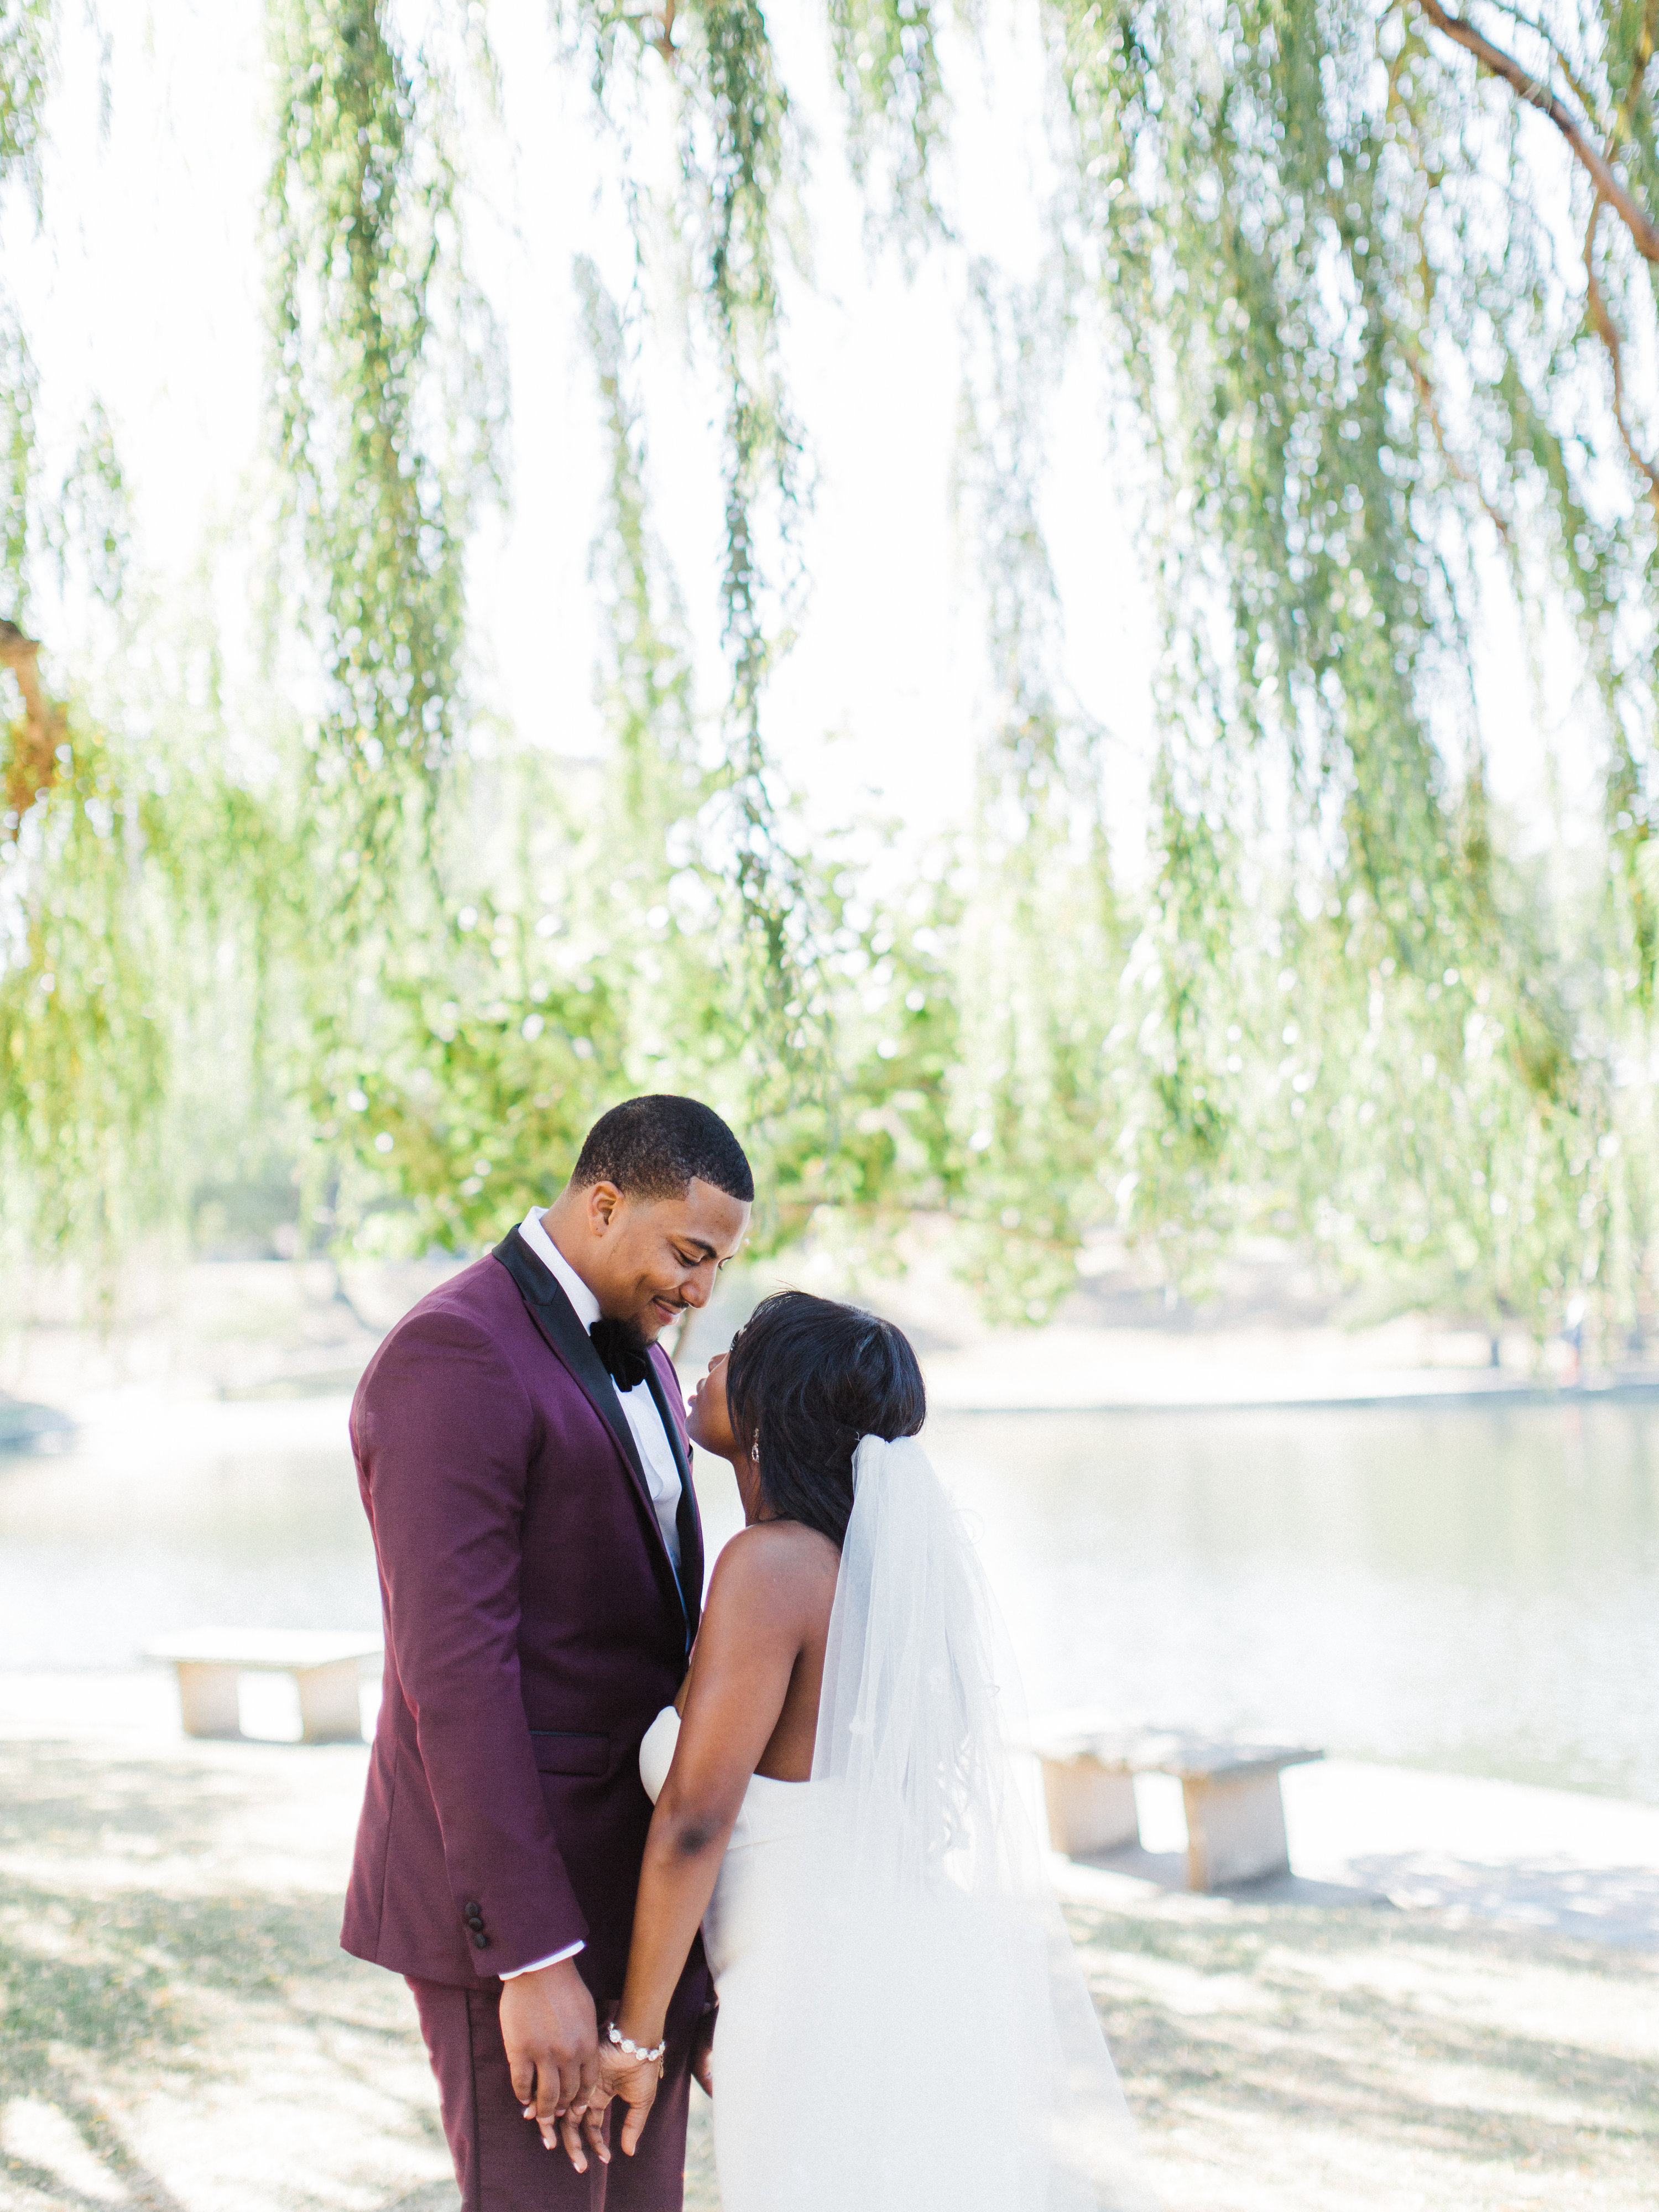 shanice & stephen wedding first look under tree